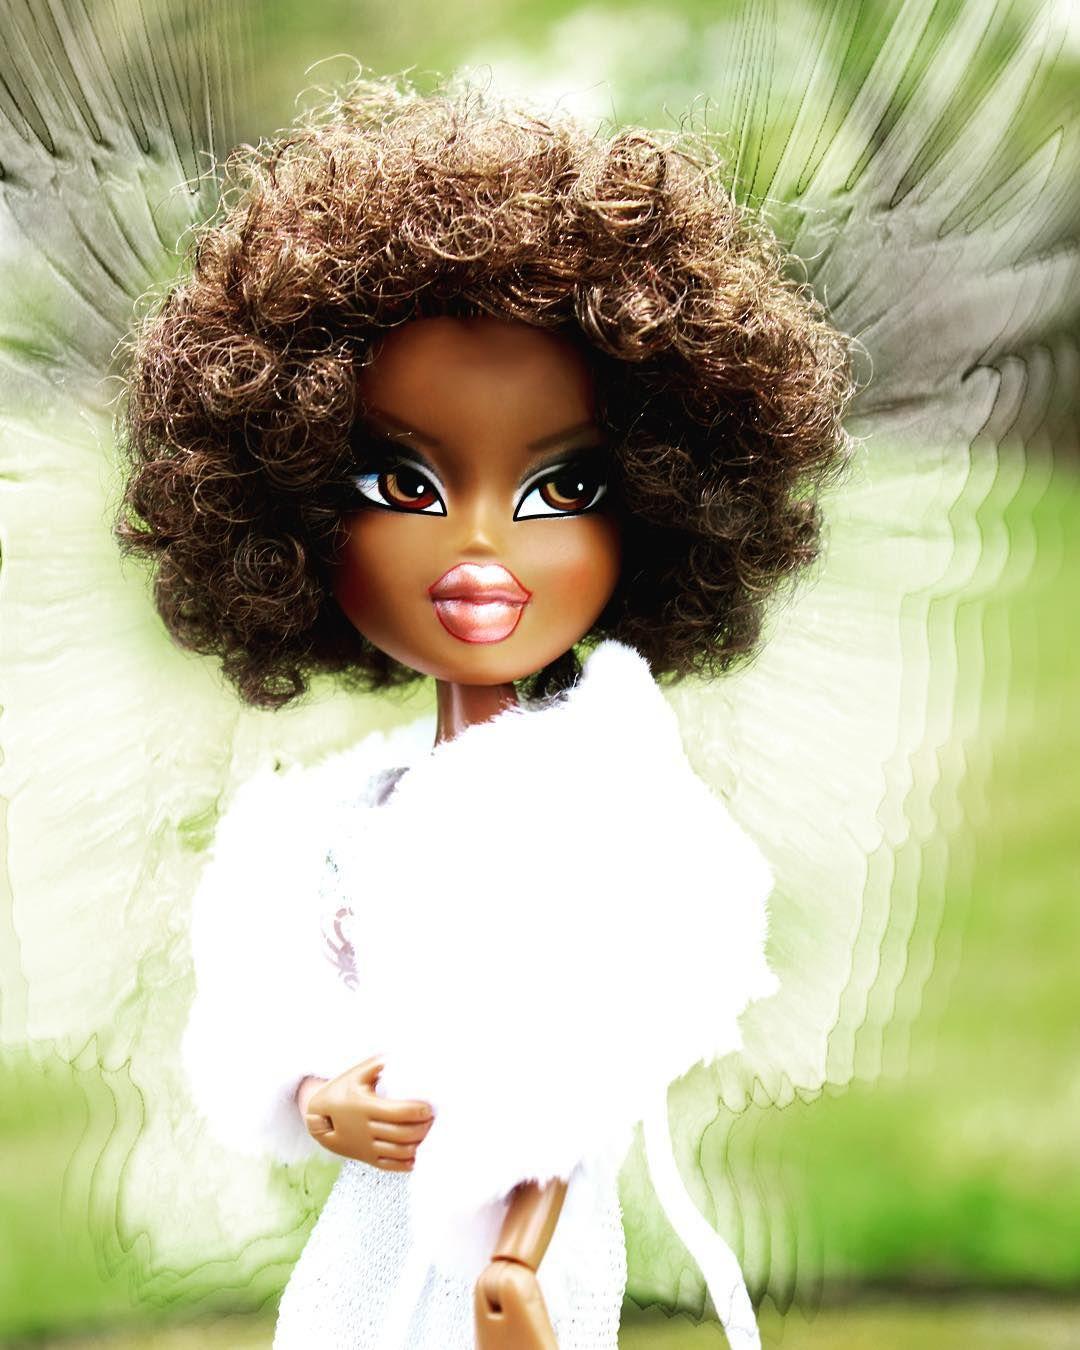 Sasha When She Is Trying To Steal Cloe S Nick Name Xd Bratz Sasha Angel Doll Dolls Dollartistry Toyartistr Black Bratz Doll Brat Doll Bratz Doll Makeup